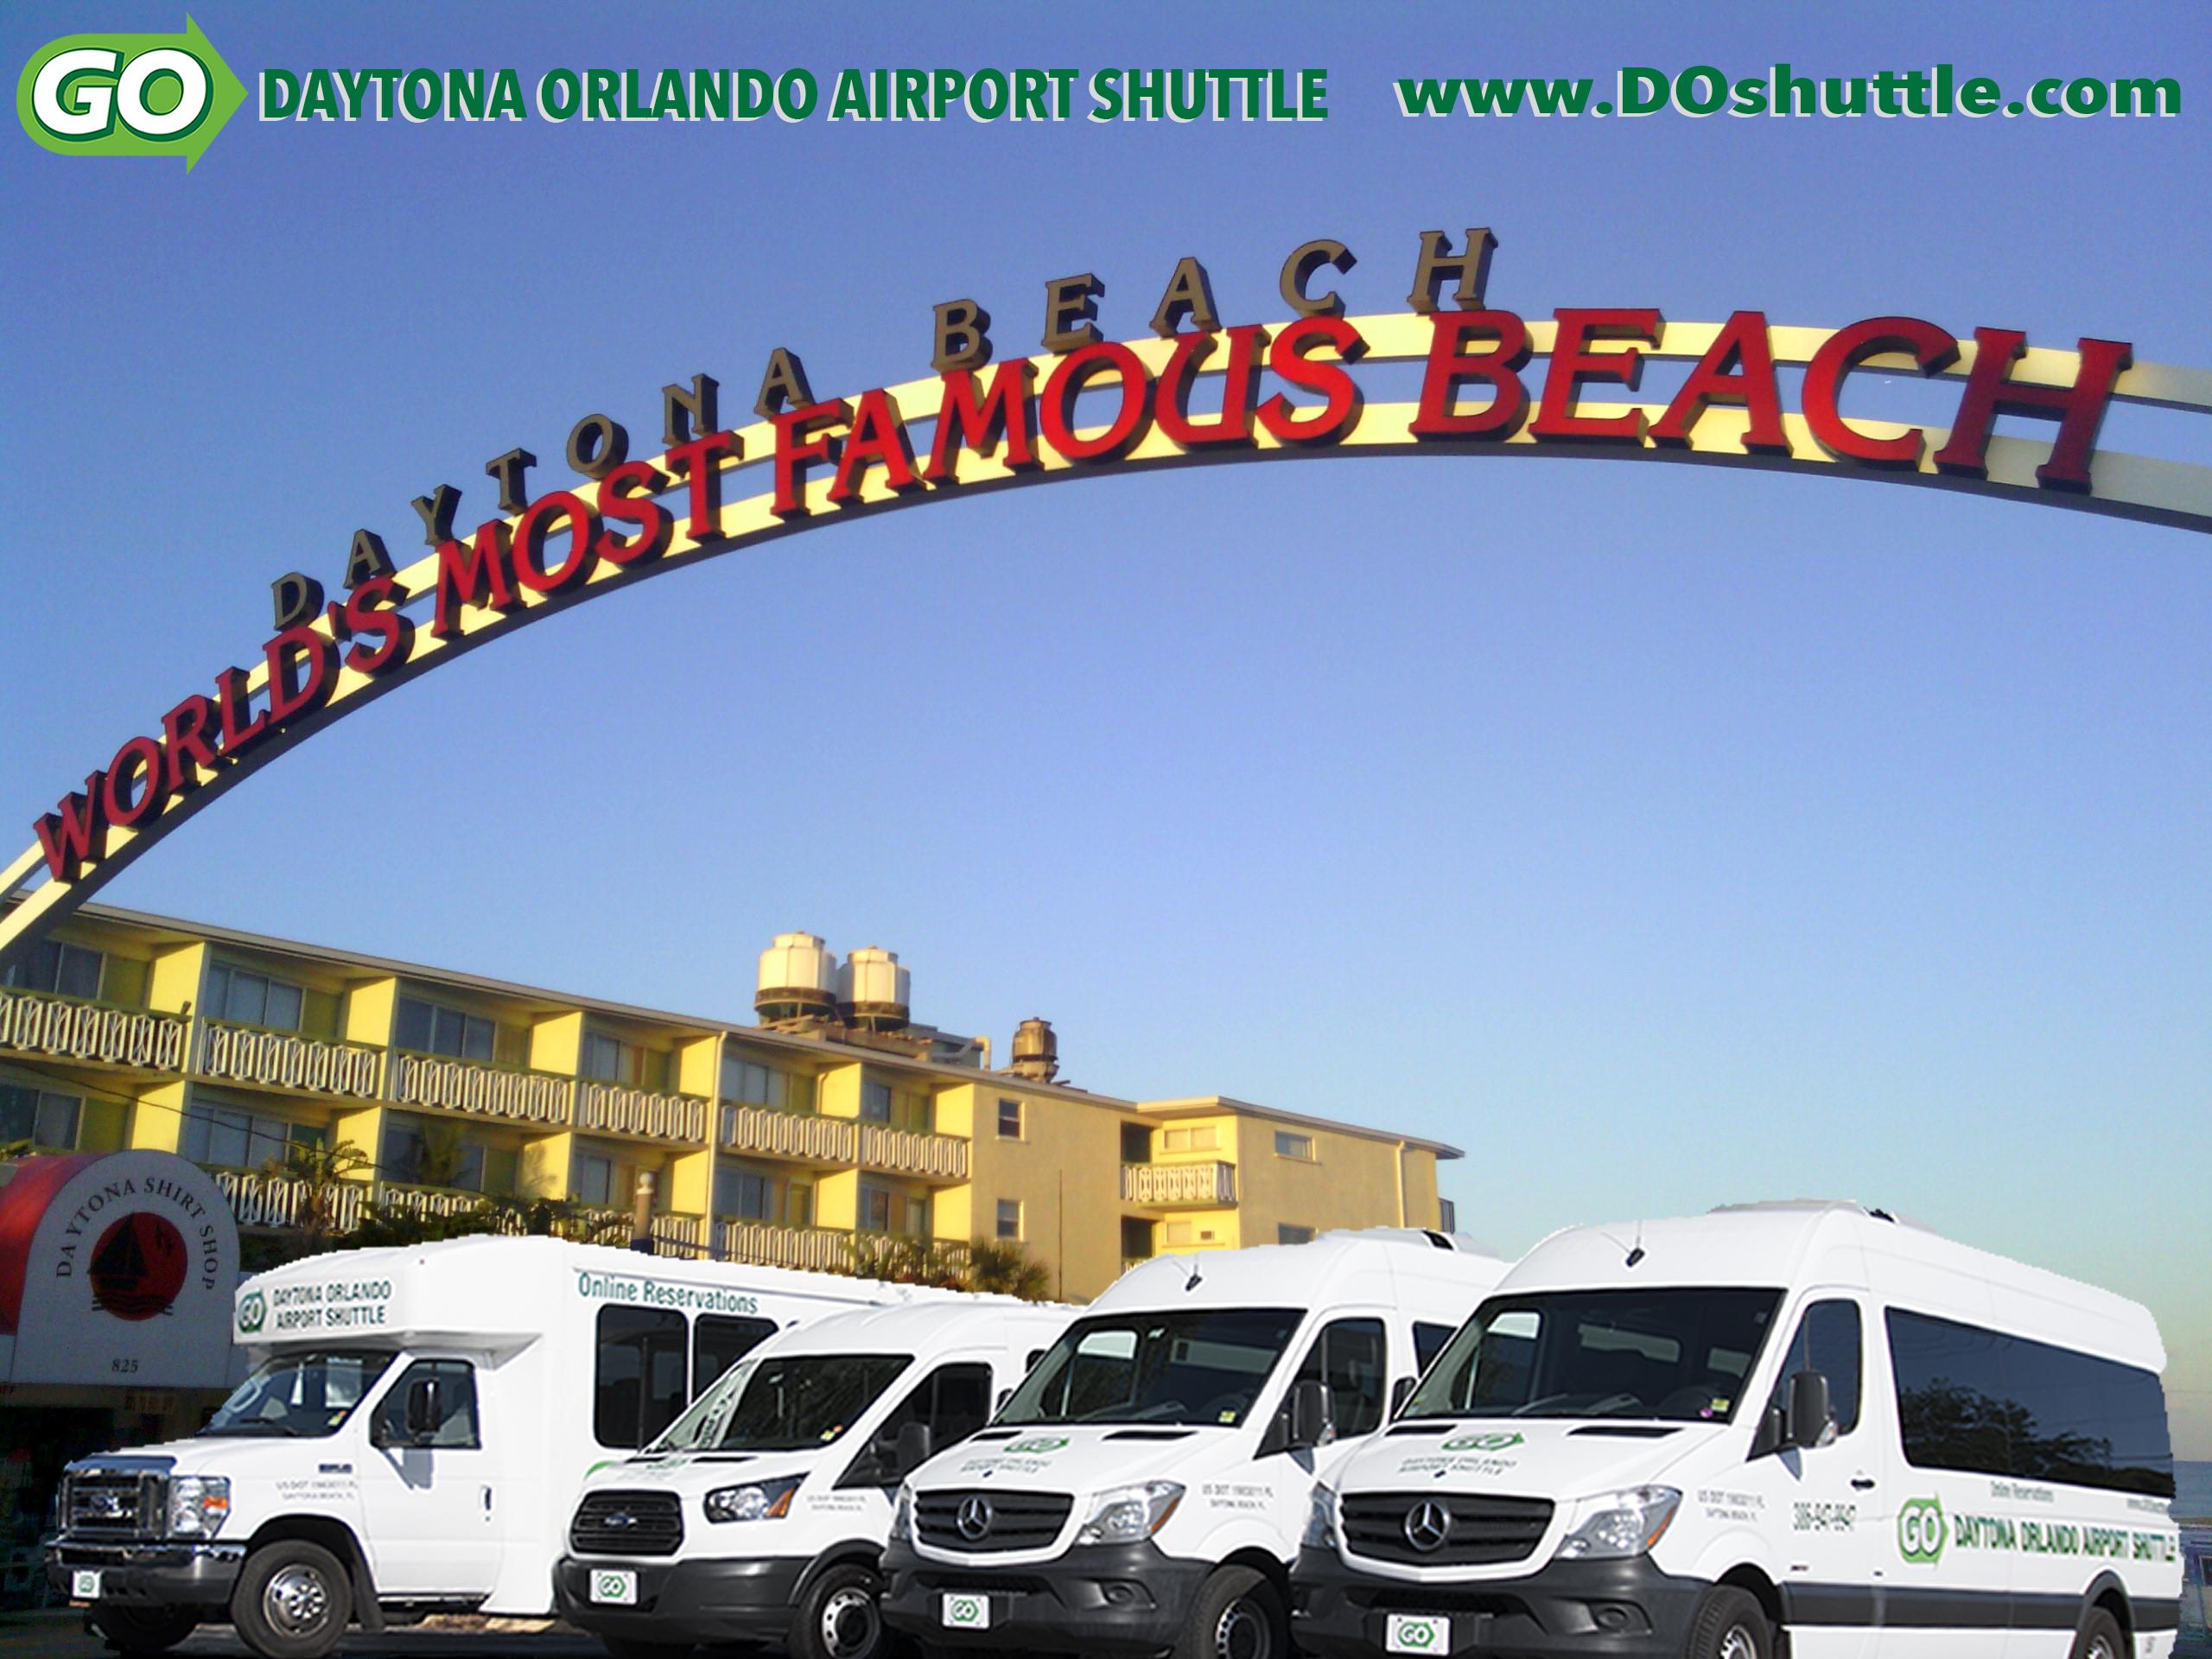 Go Daytona Orlando Airport Shuttle Doshuttle 1339 Beville Rd Beach Fl Transportation Service Mapquest